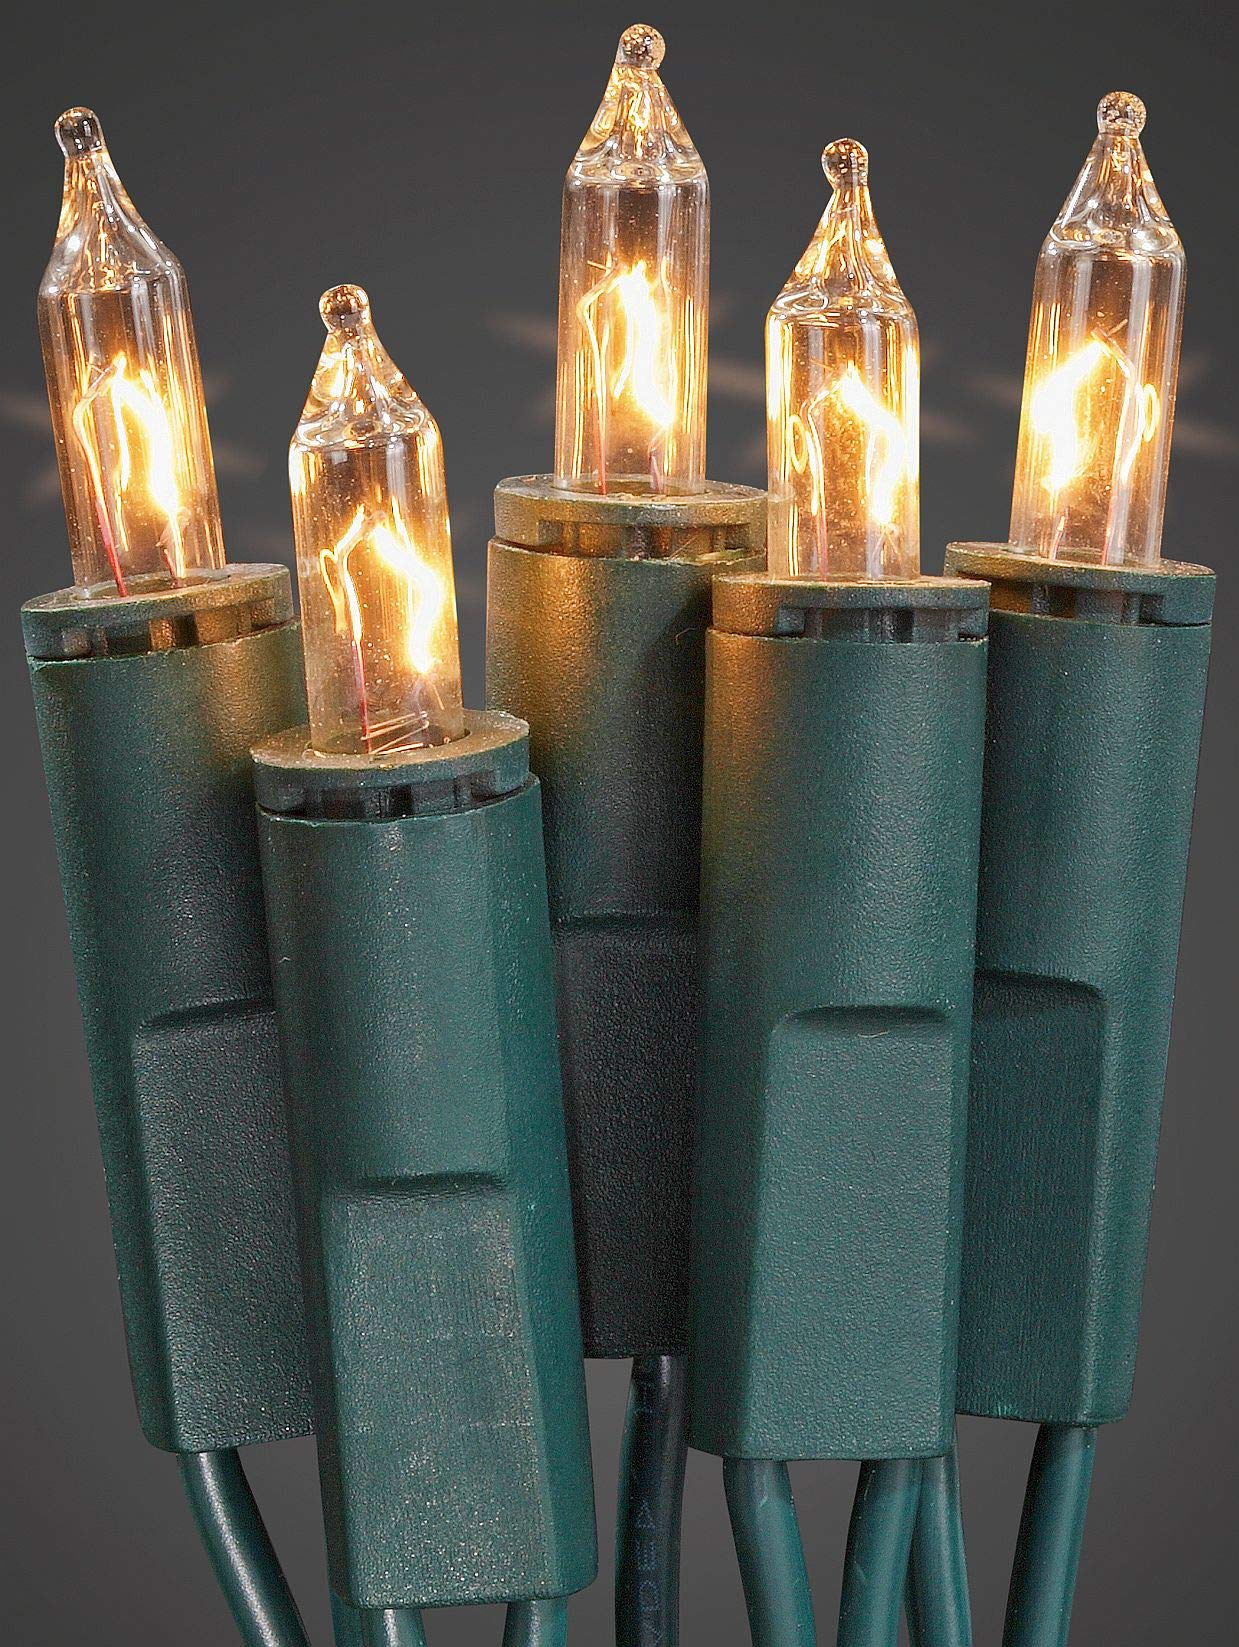 Hellum-833515-35-tlg-Minikette-grnklar-Innenbeleuchtung-Fassungsabstand-15-cm-Steckerzuleitung-2x15m-Pisellokerze-mit-Stecksockel-GL-810m-Inkl-Ersatzlmpchen